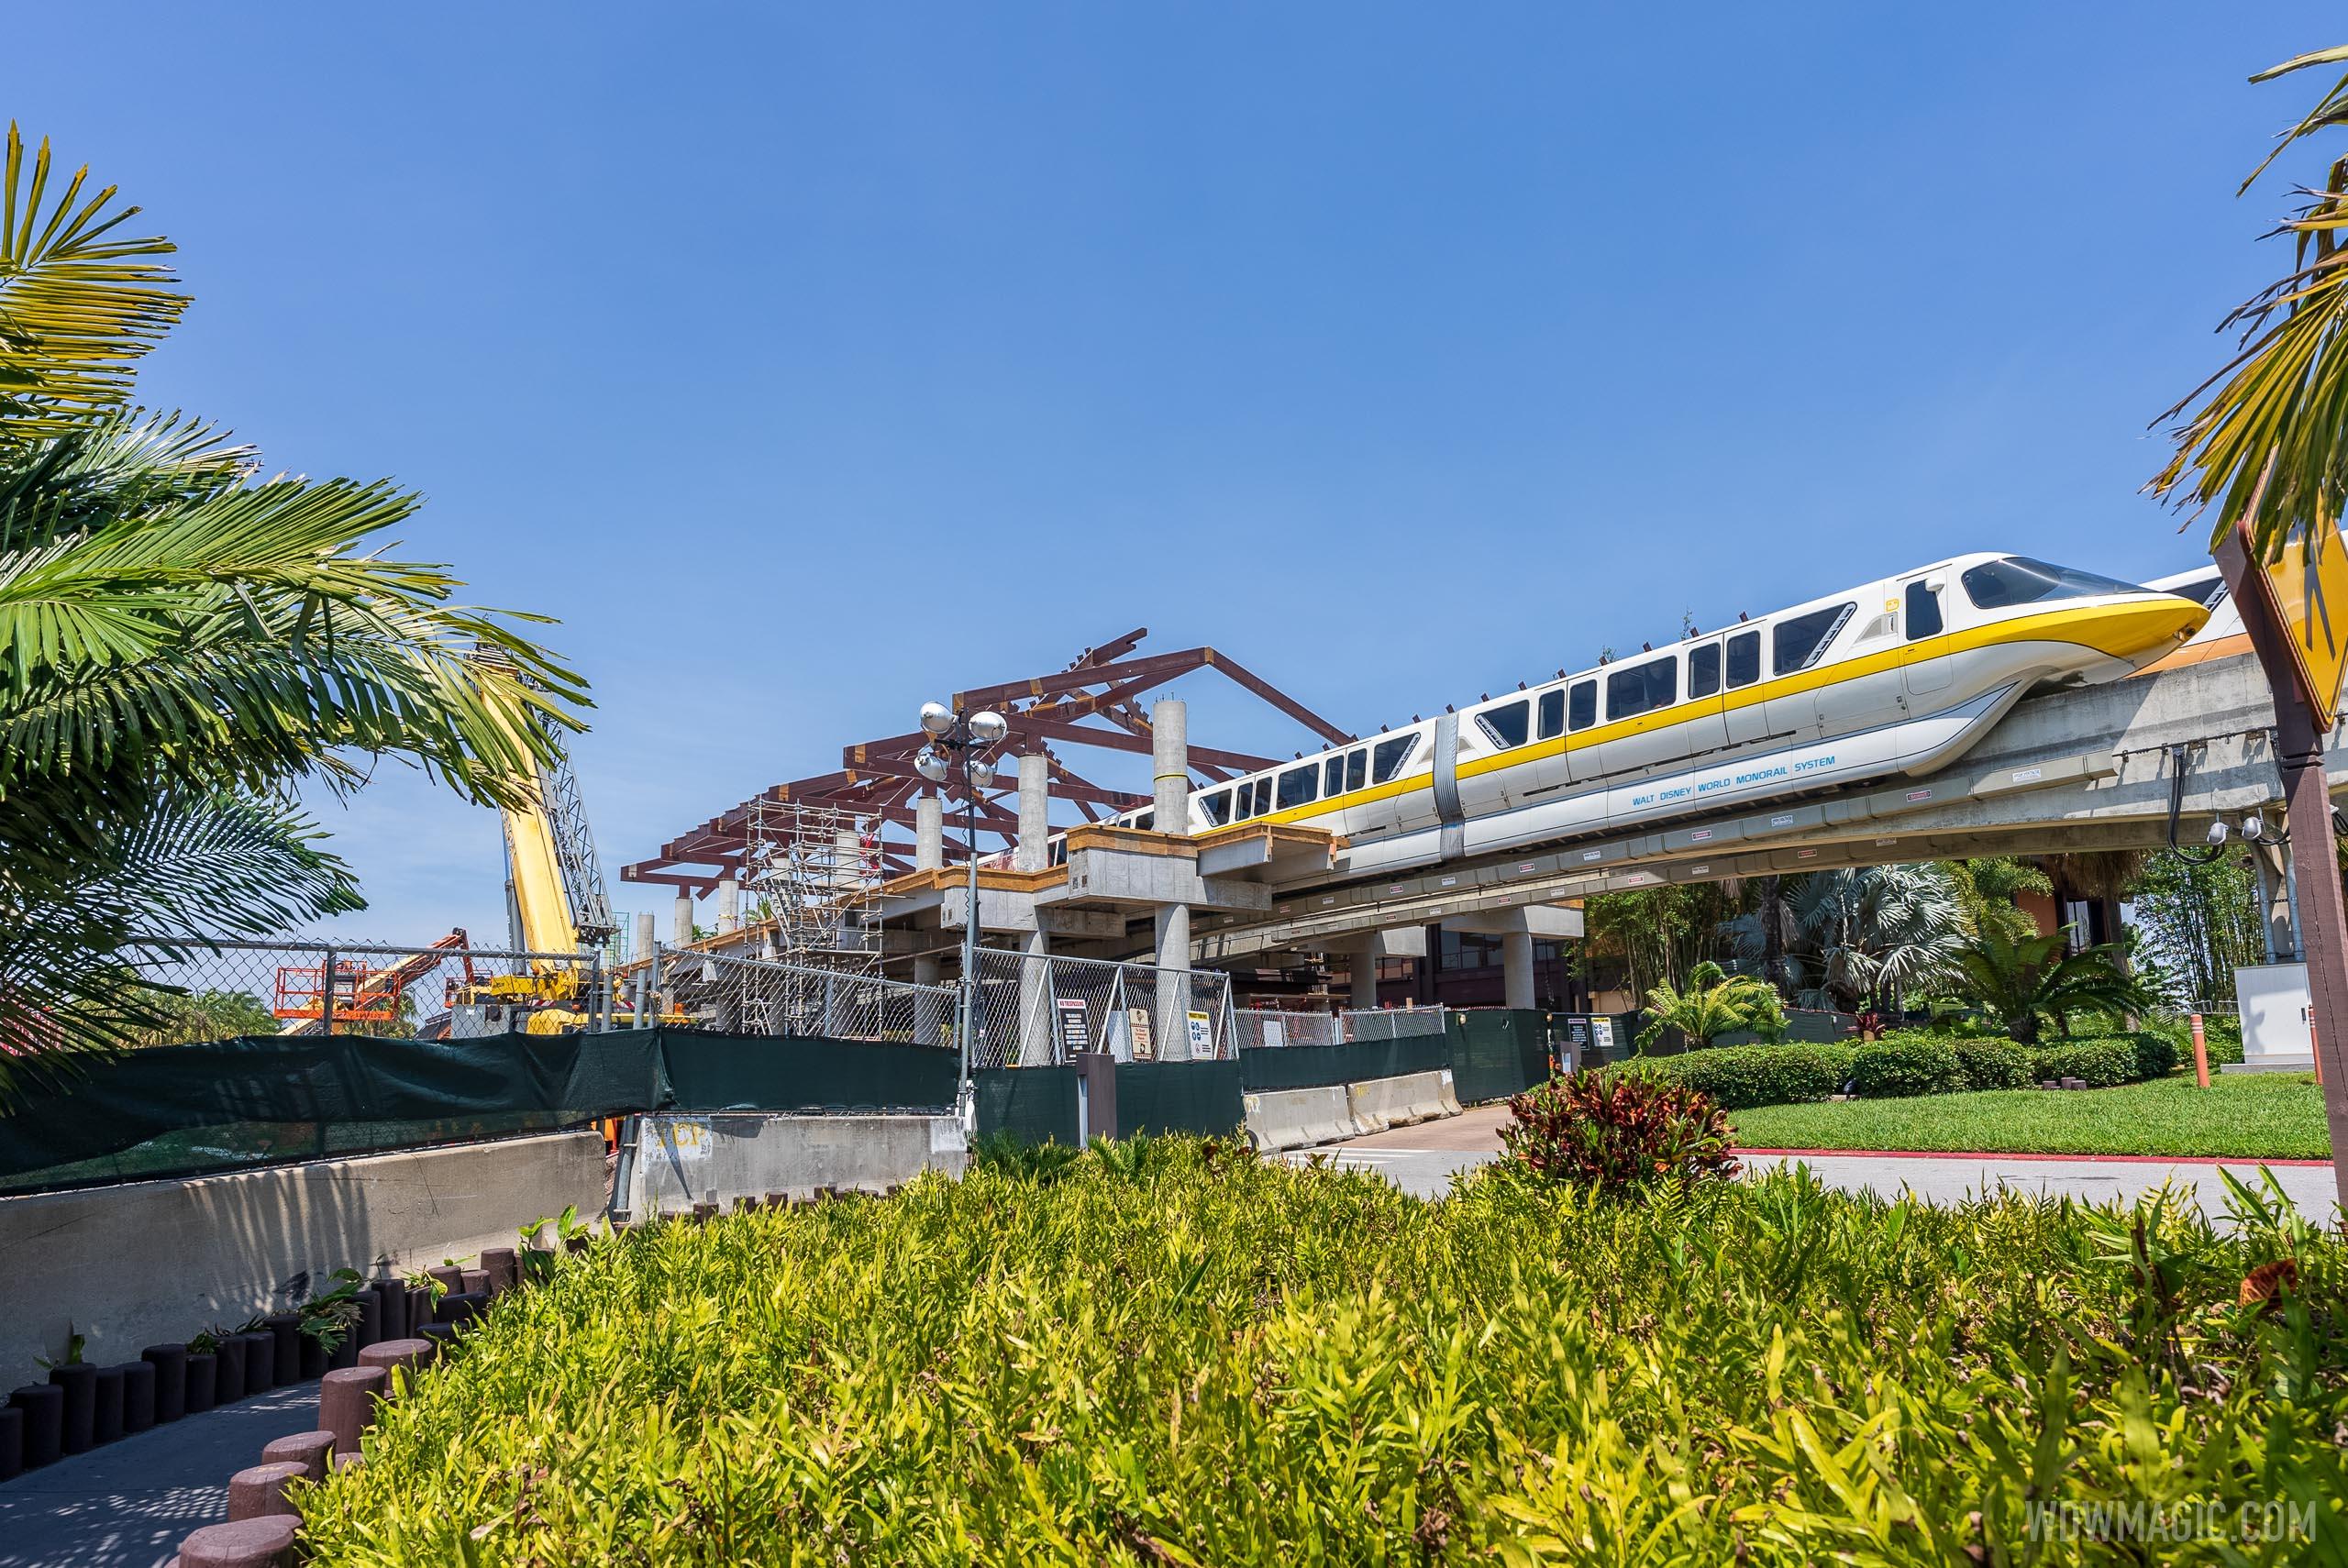 New Monorail station taking shape at Disney's Polynesian Village Resort